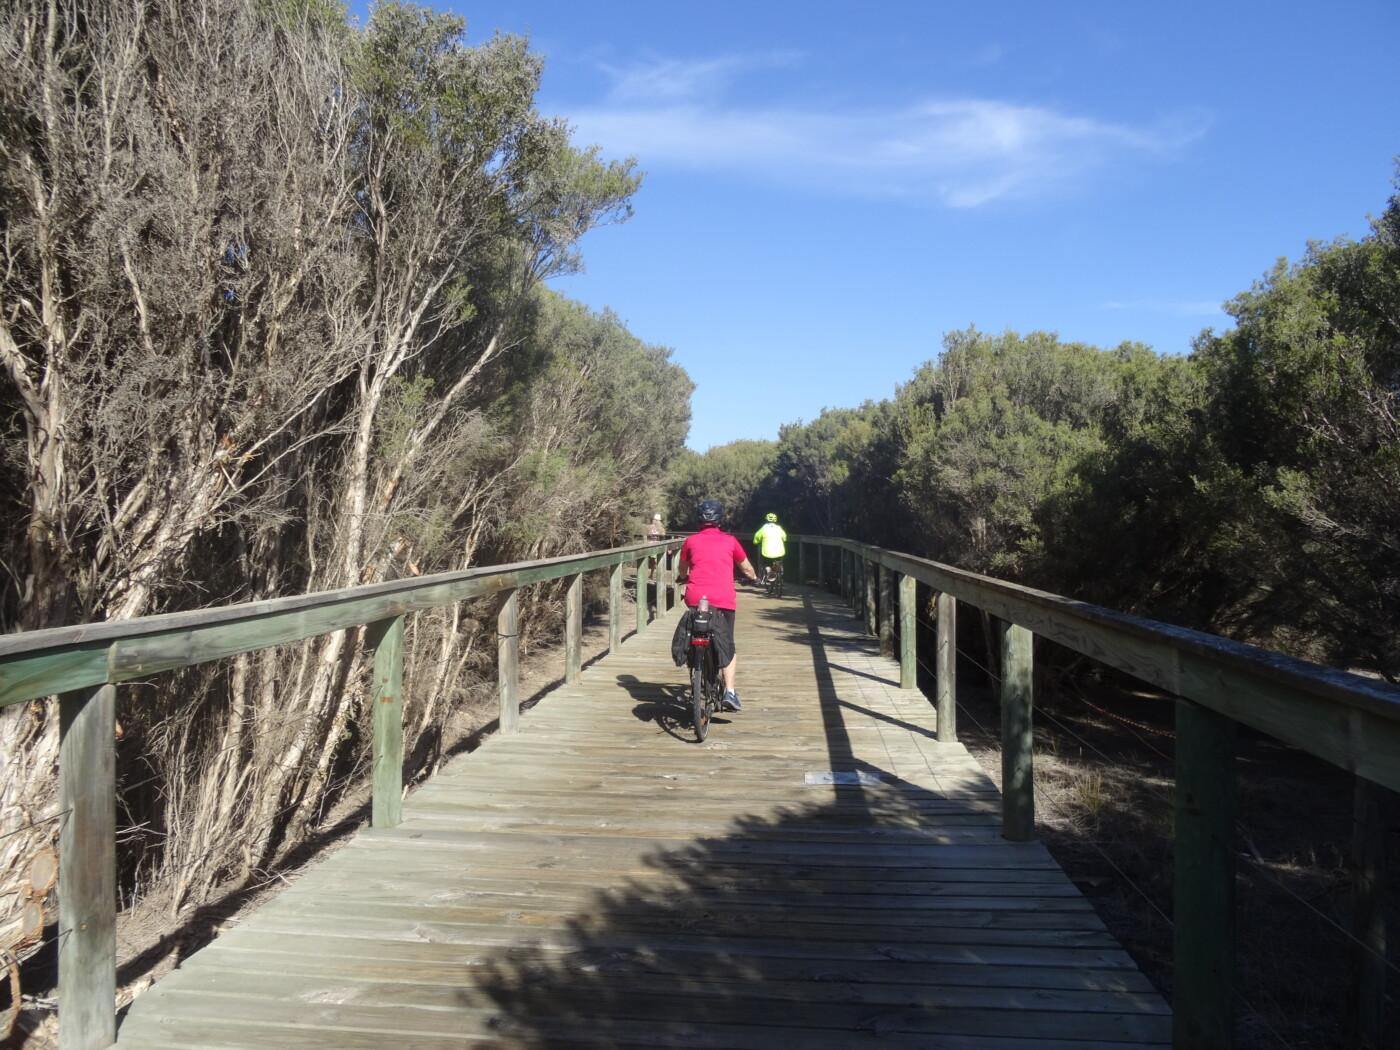 boardwalk through Tokuremoar Wetland